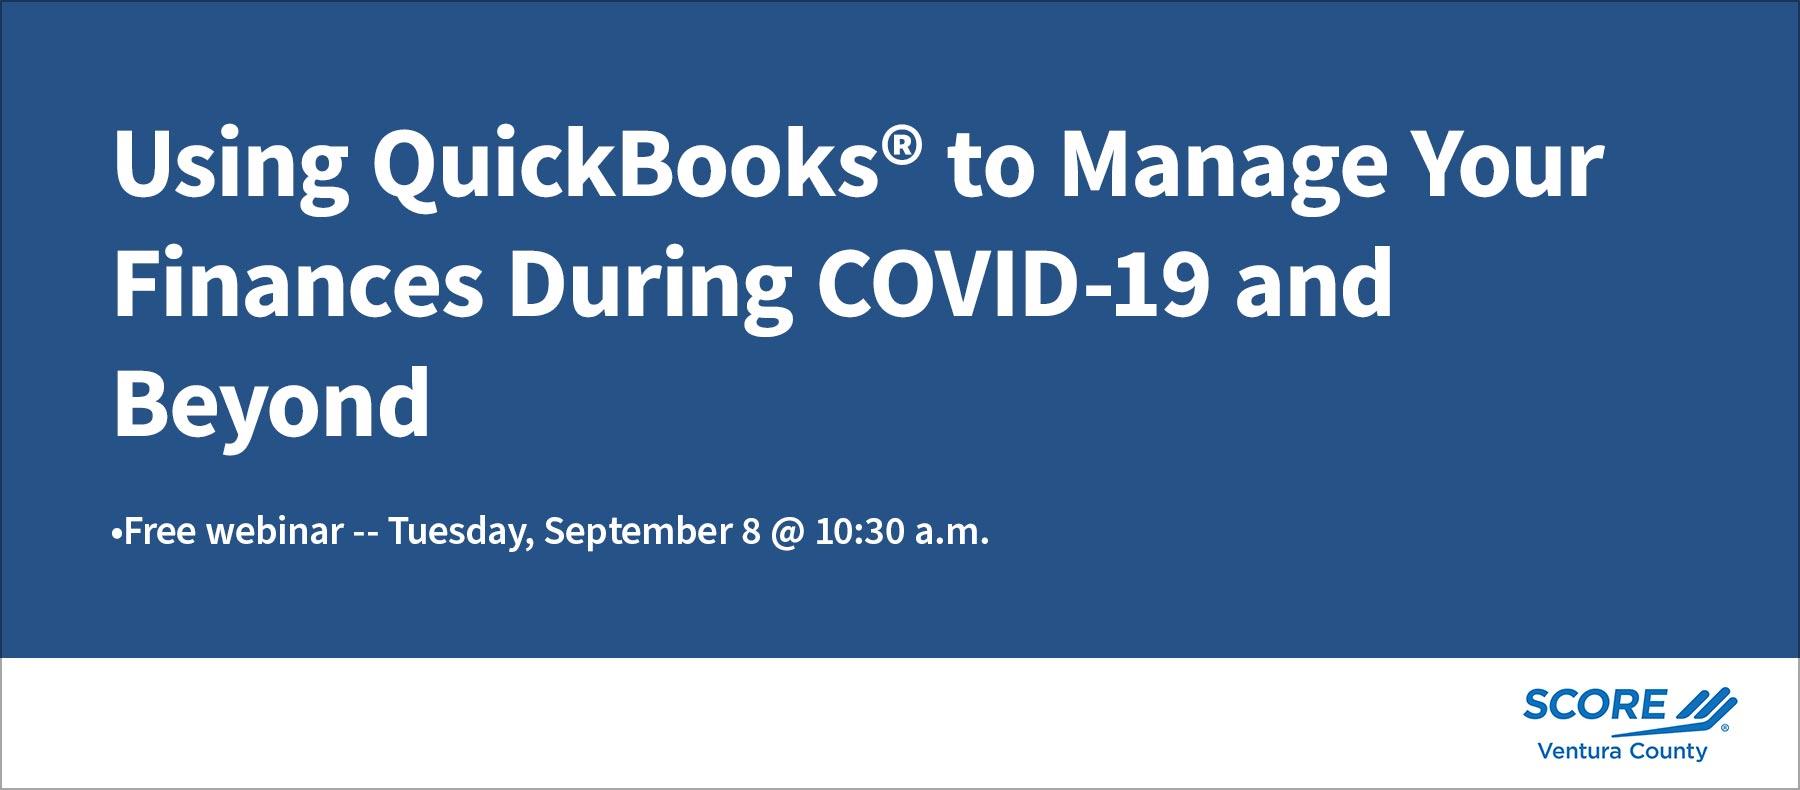 SCORE Ventura Webinar 9/8/20 Using Quickbooks to Manage Finaances